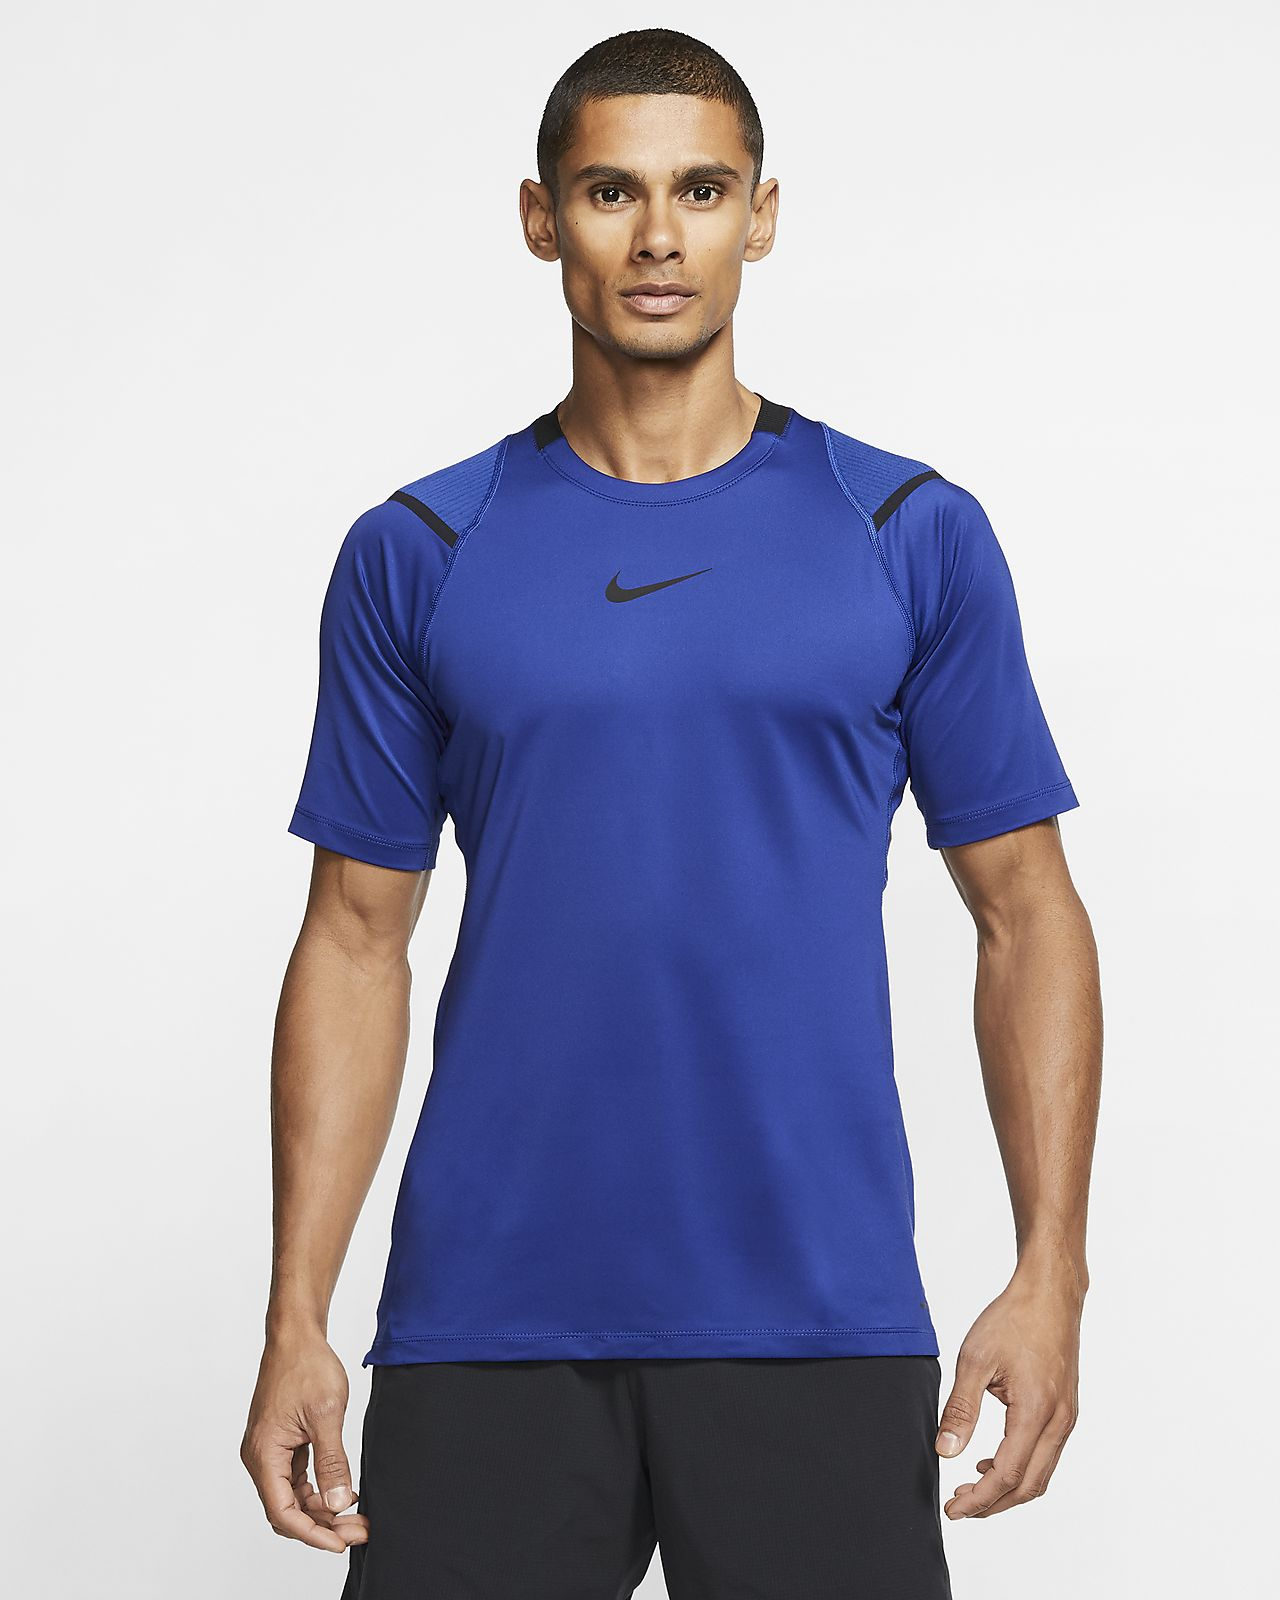 Nike Pro AeroAdapt Men's Short Sleeve Top